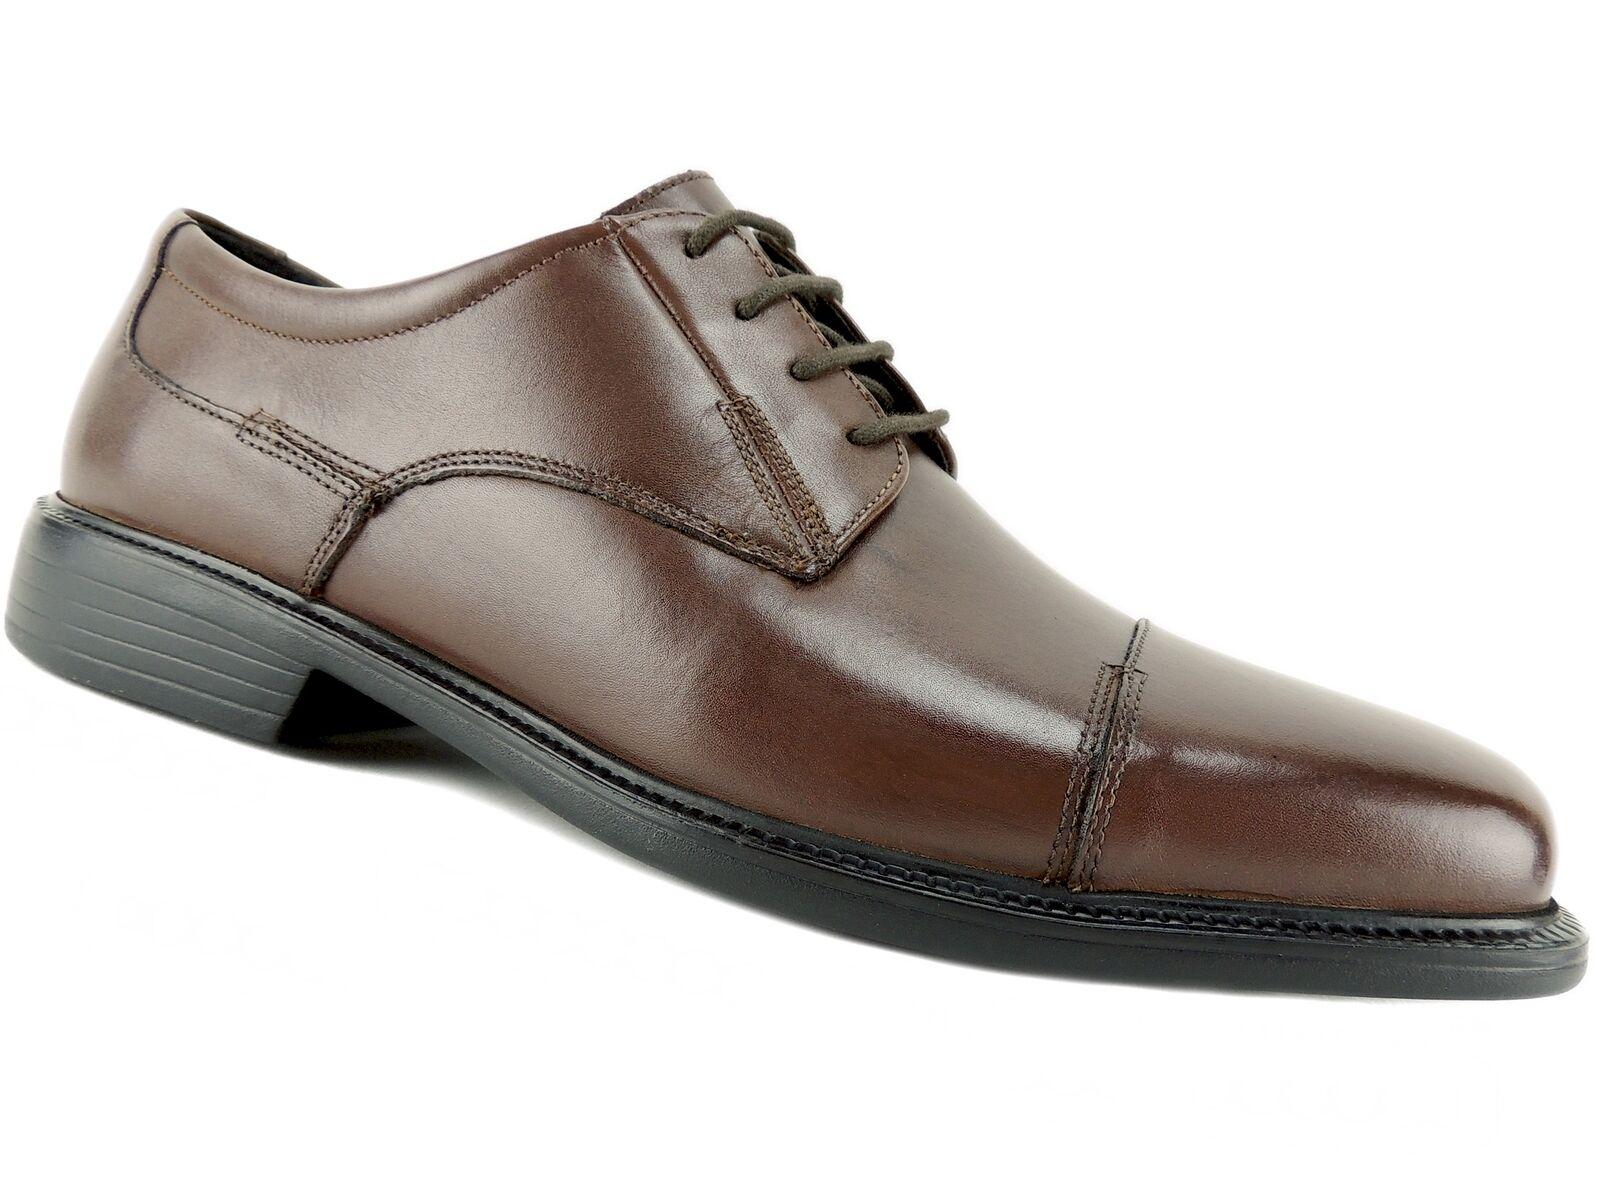 Bostonian Men's Wenham Dress Cap-Toe Oxfords Brown Leather 10 M